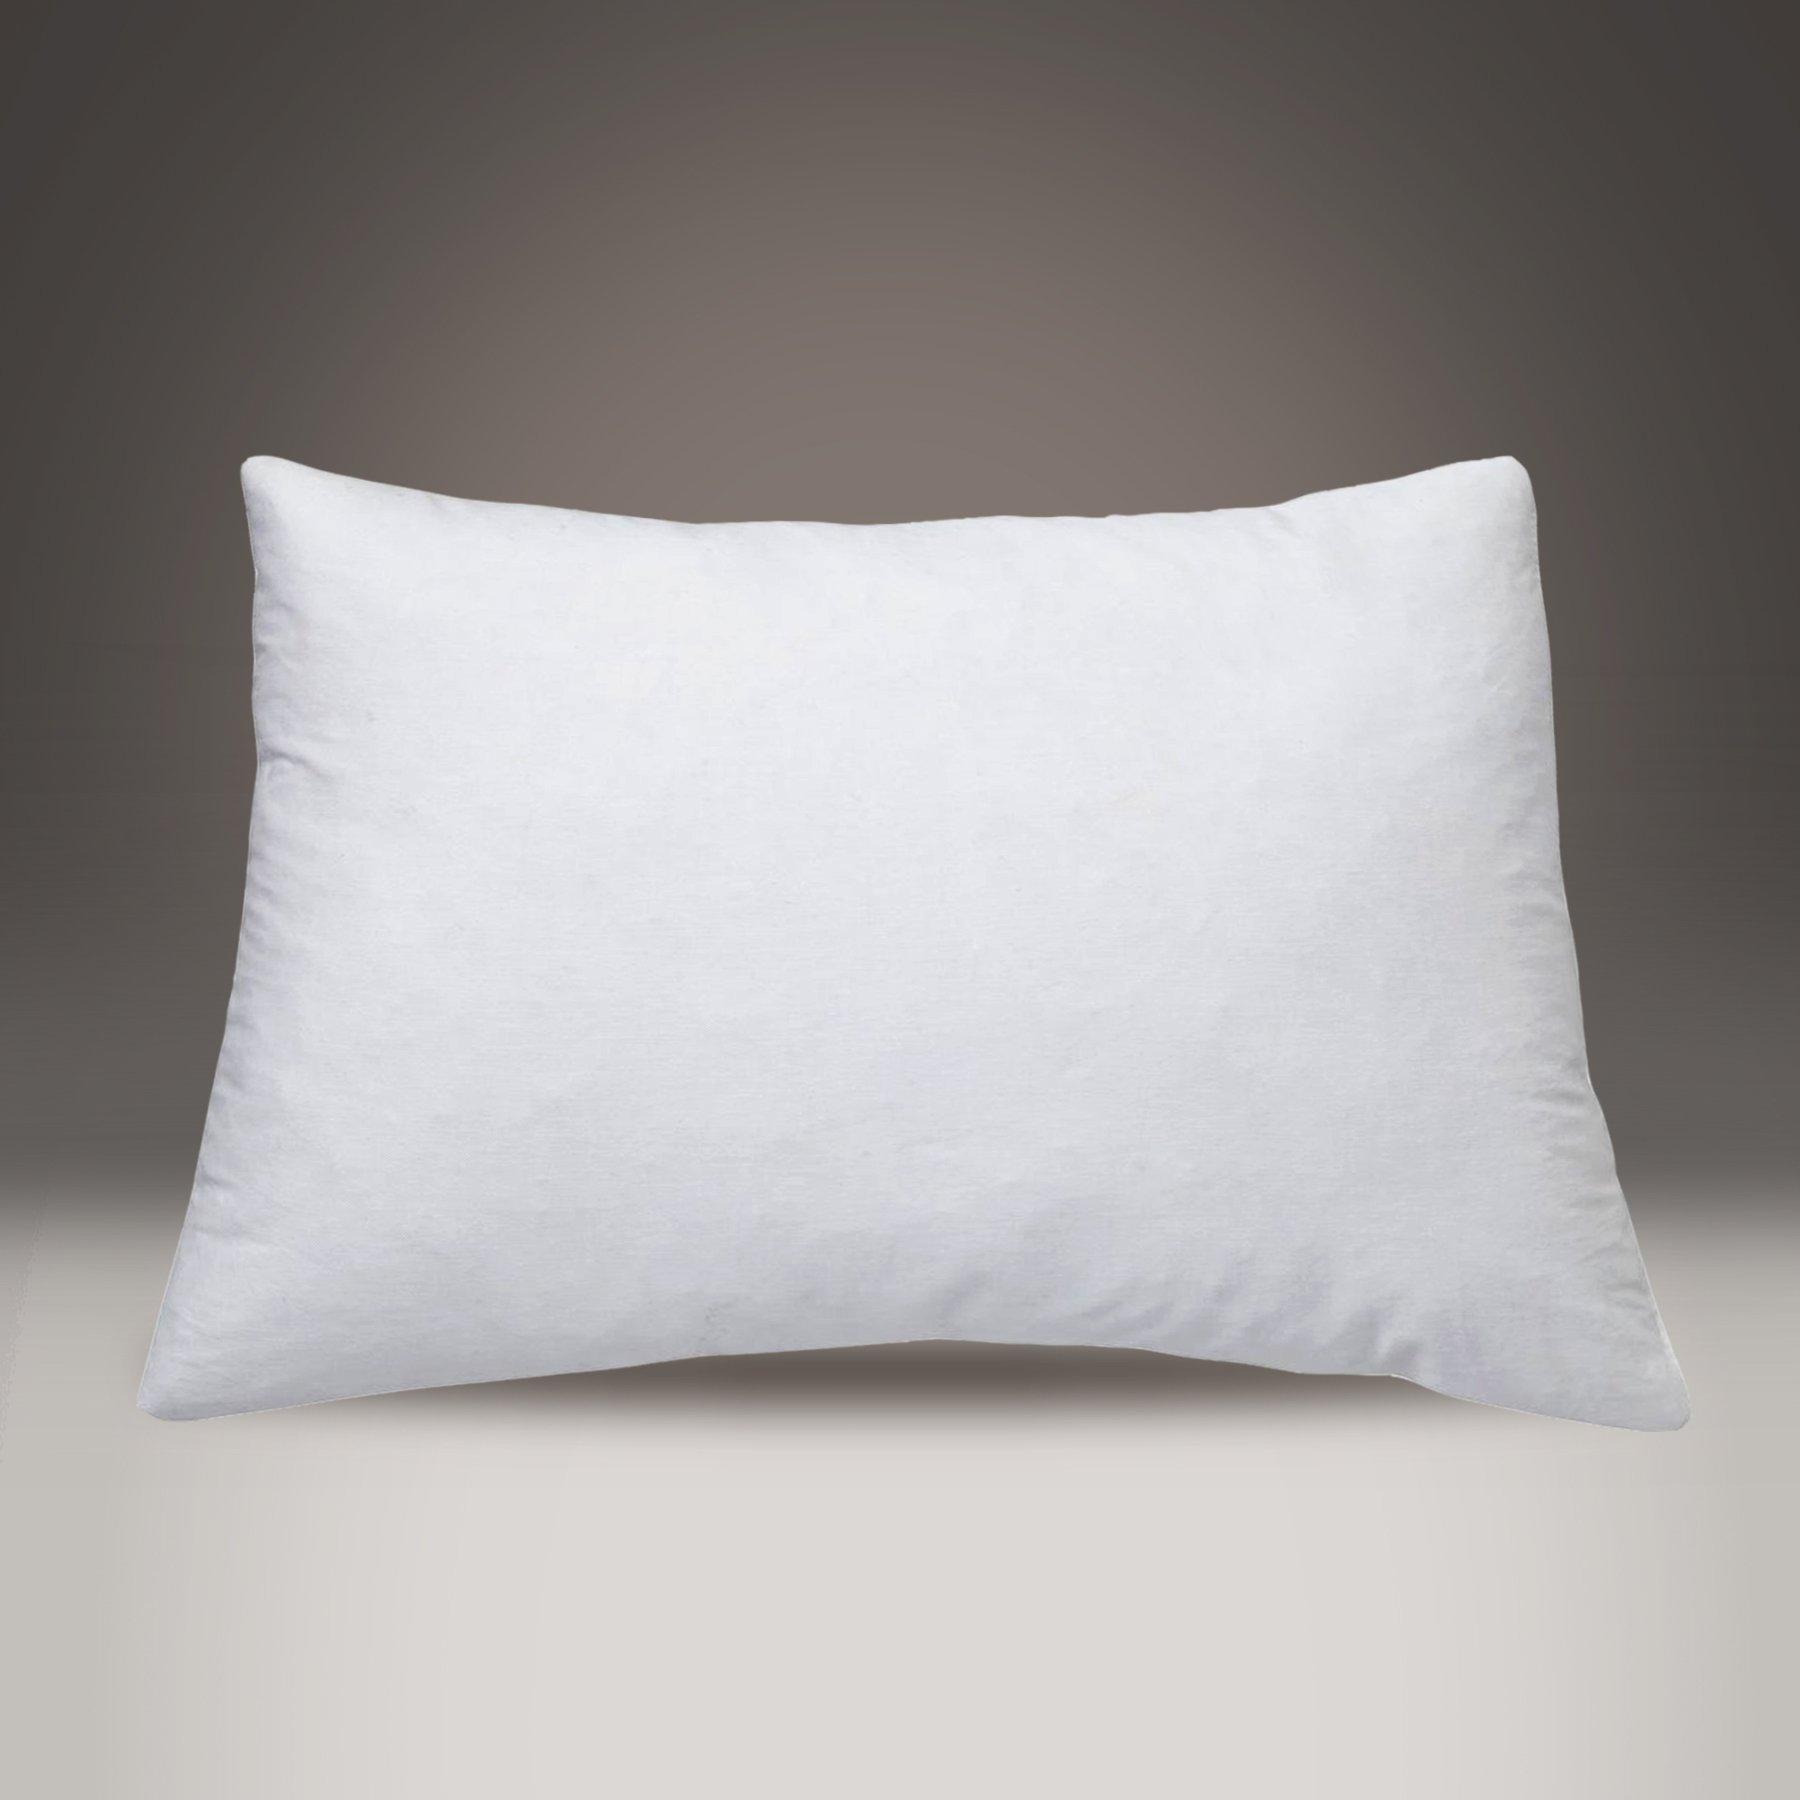 Luxurious Hungarian Goose Down Chamber Pillow. 700+ fill power, 100% cotton batiste casing